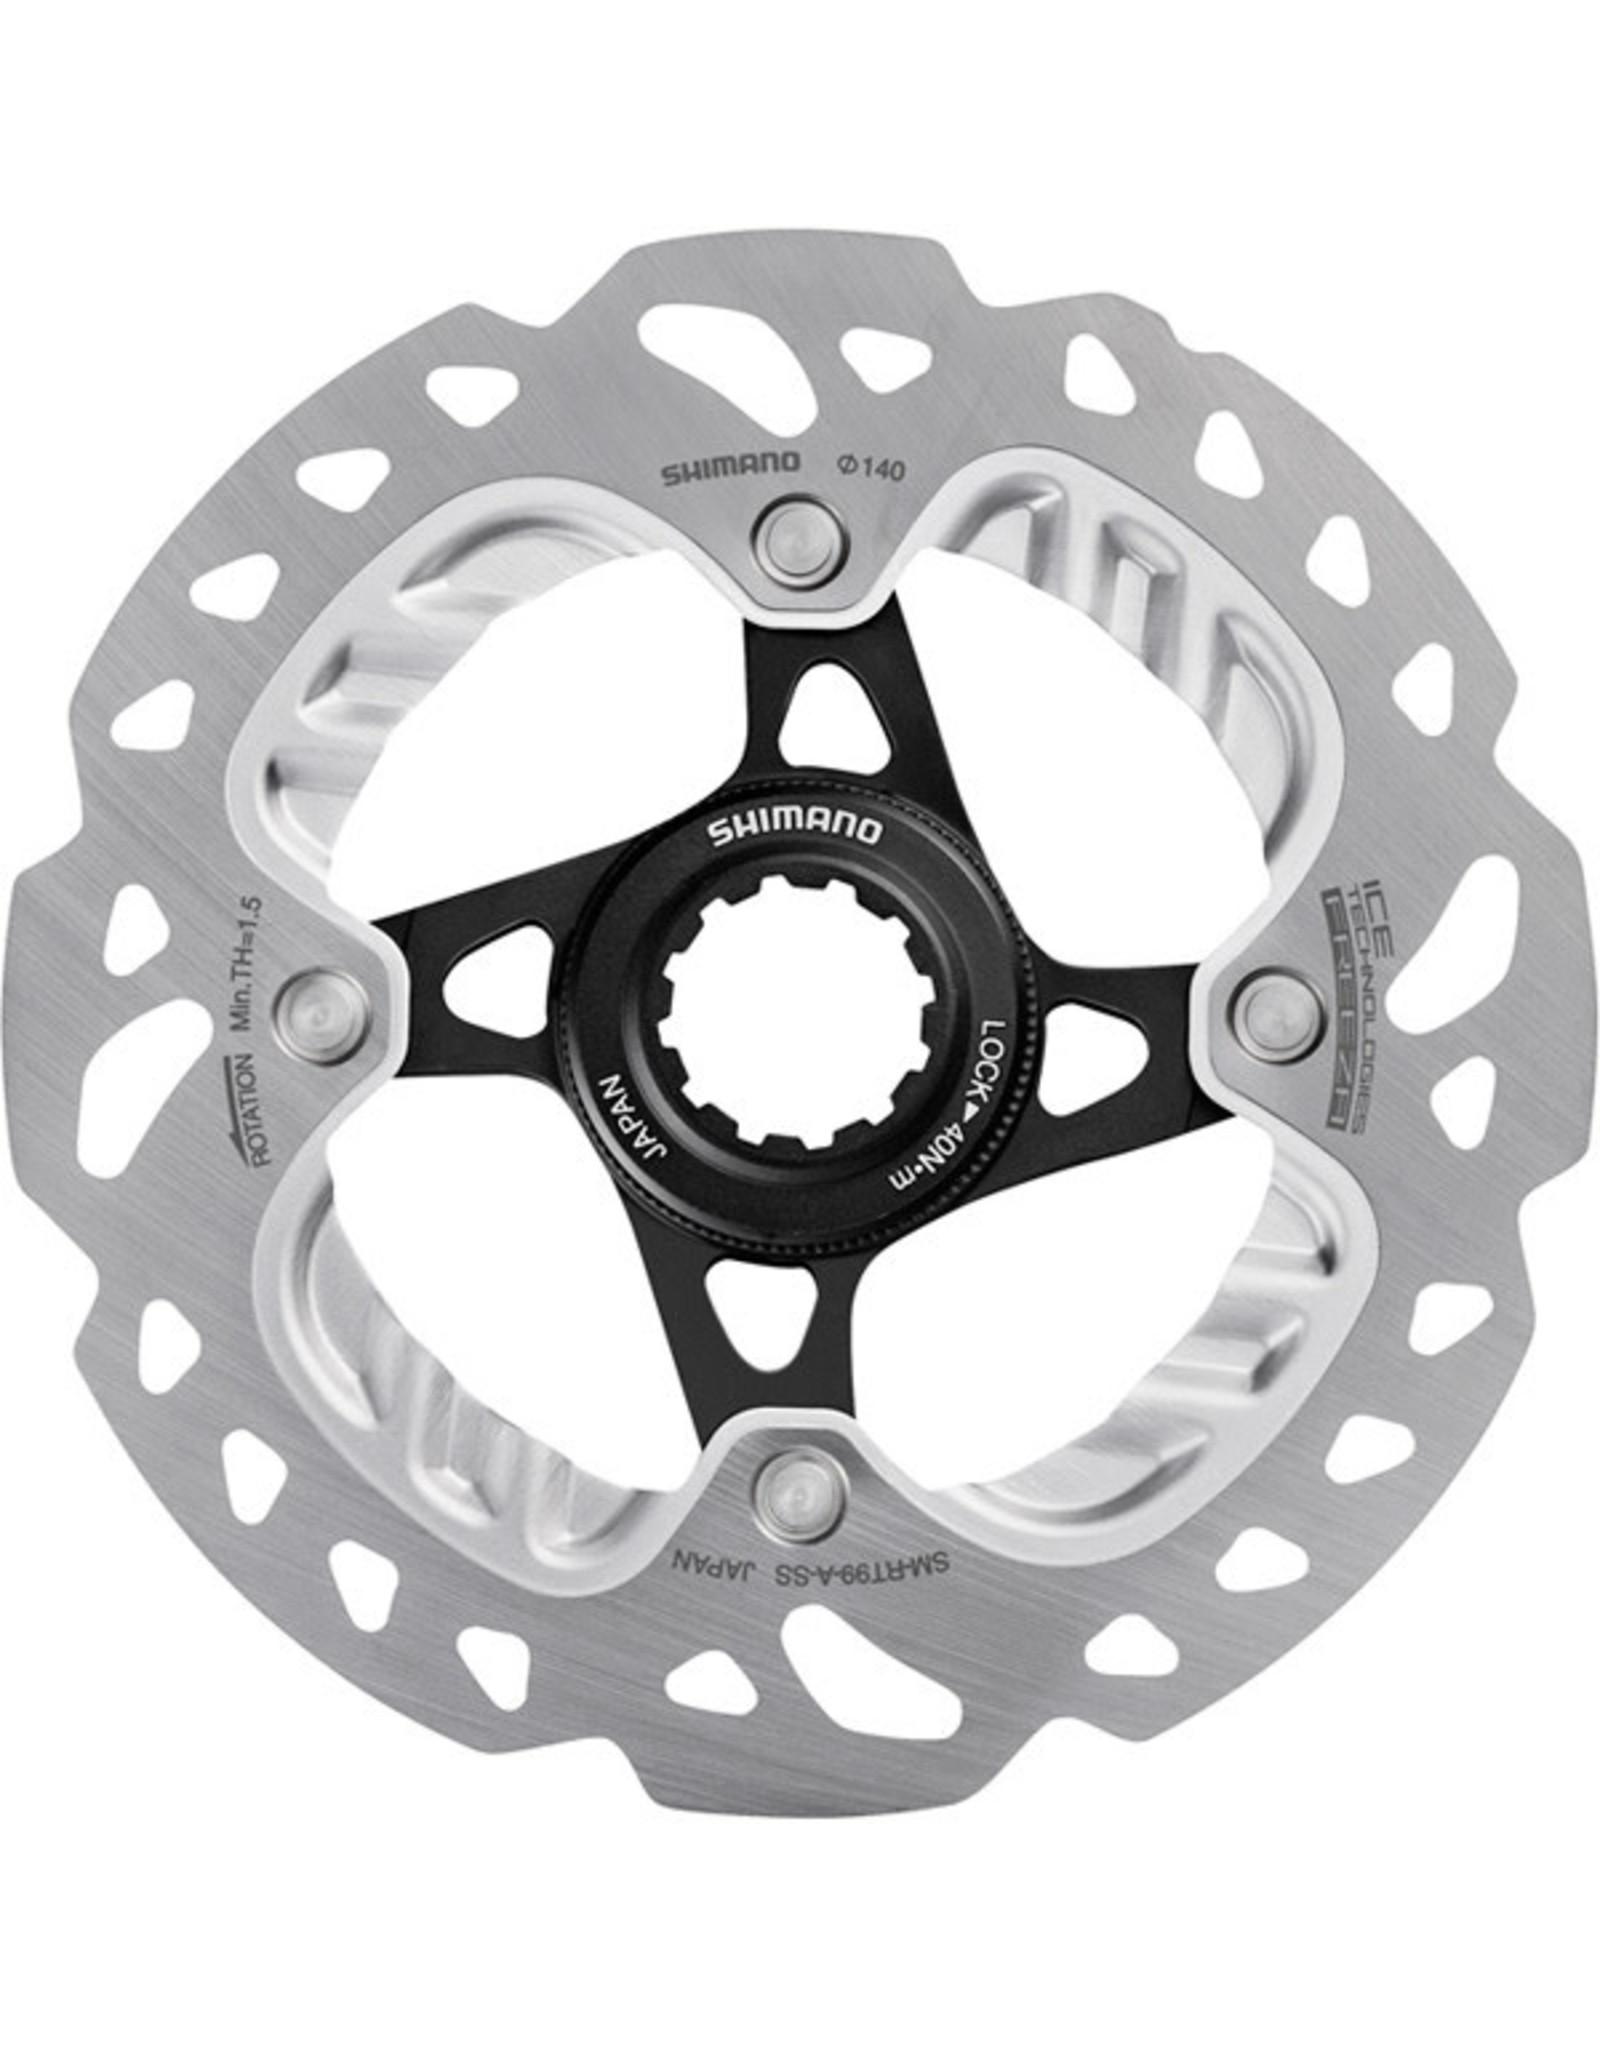 Shimano Disc Rotor XTR SMRT99 Center-Lock Ice Tech